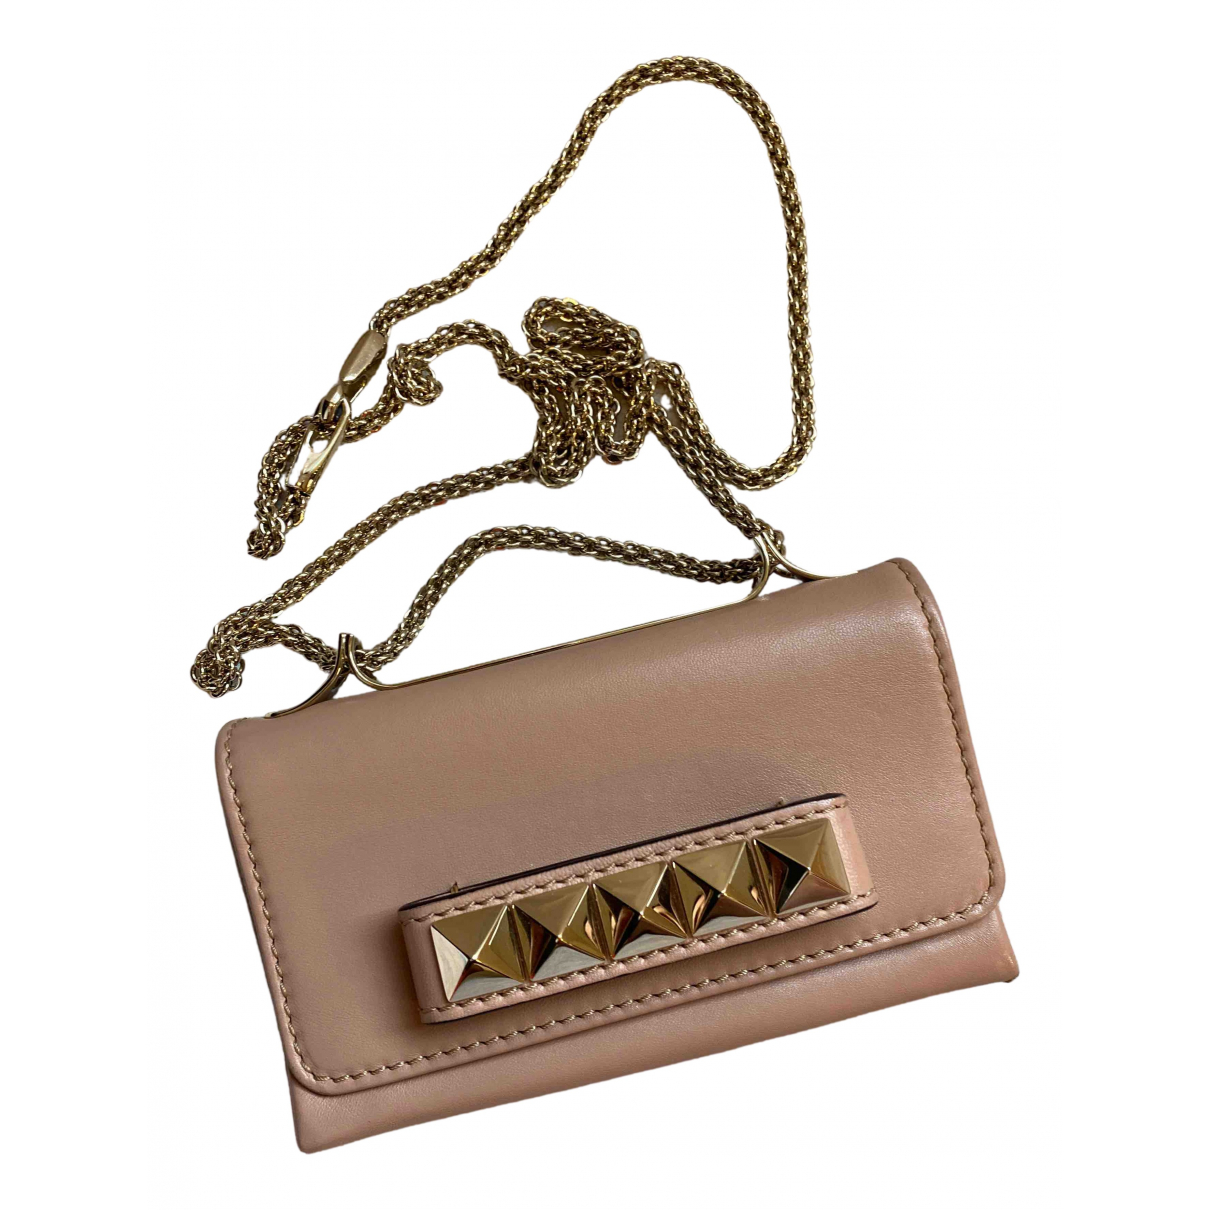 Valentino Garavani Vavavoom Pink Leather handbag for Women N